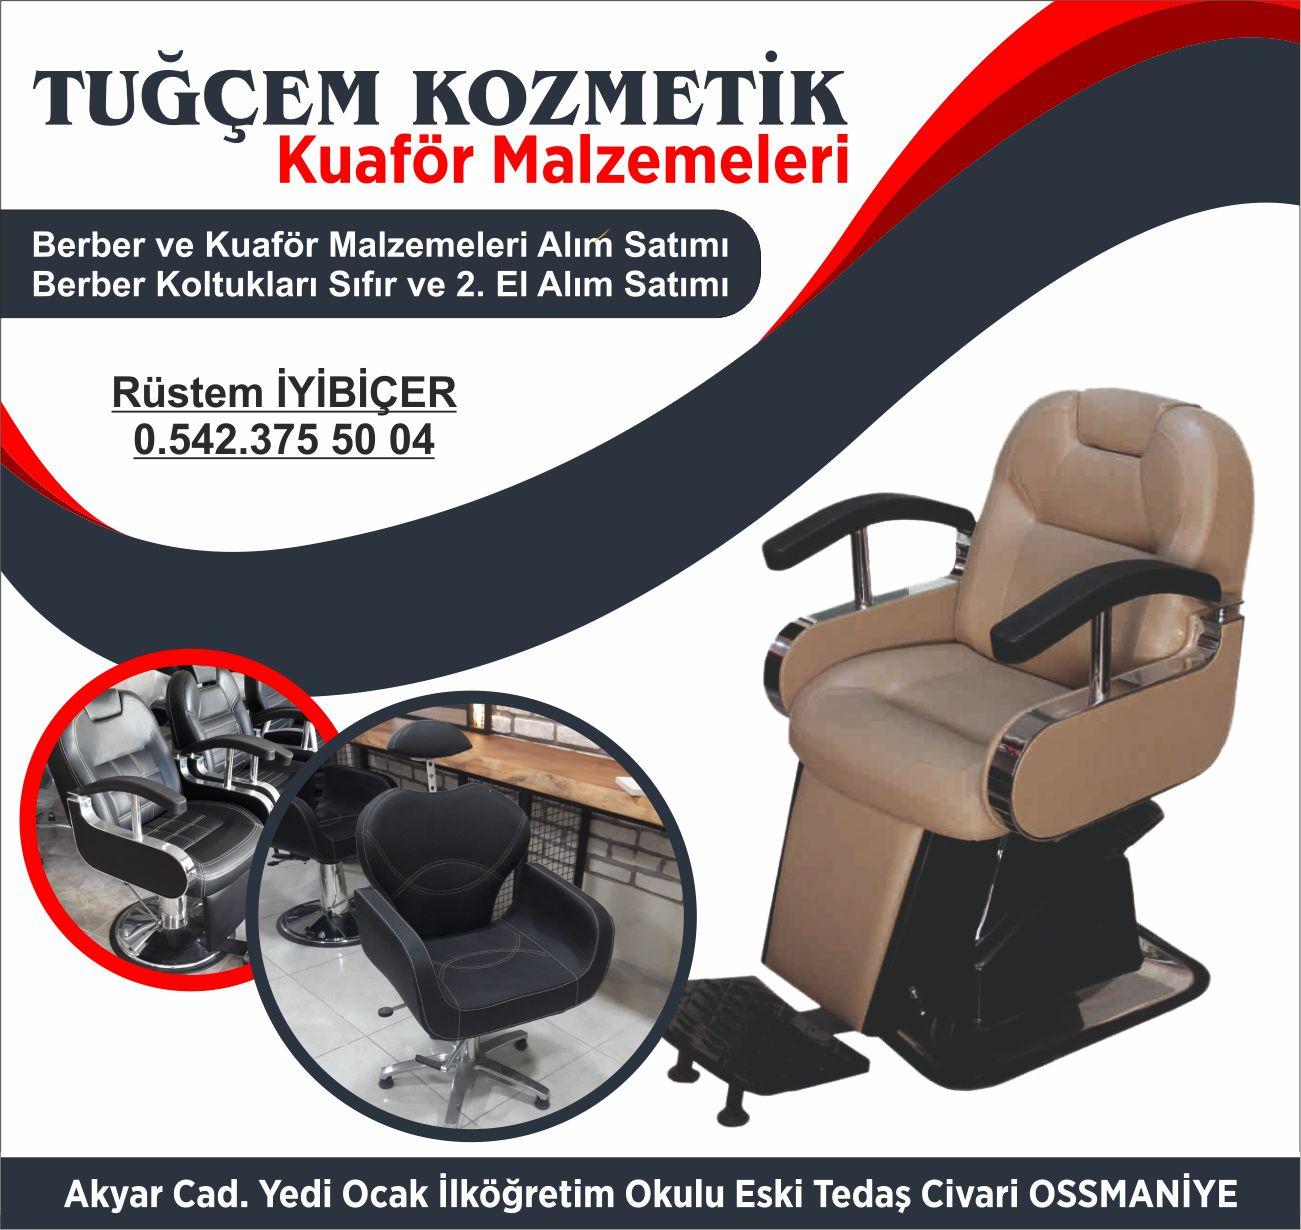 https osmaniye genckobi com firma tugcem kozmetik